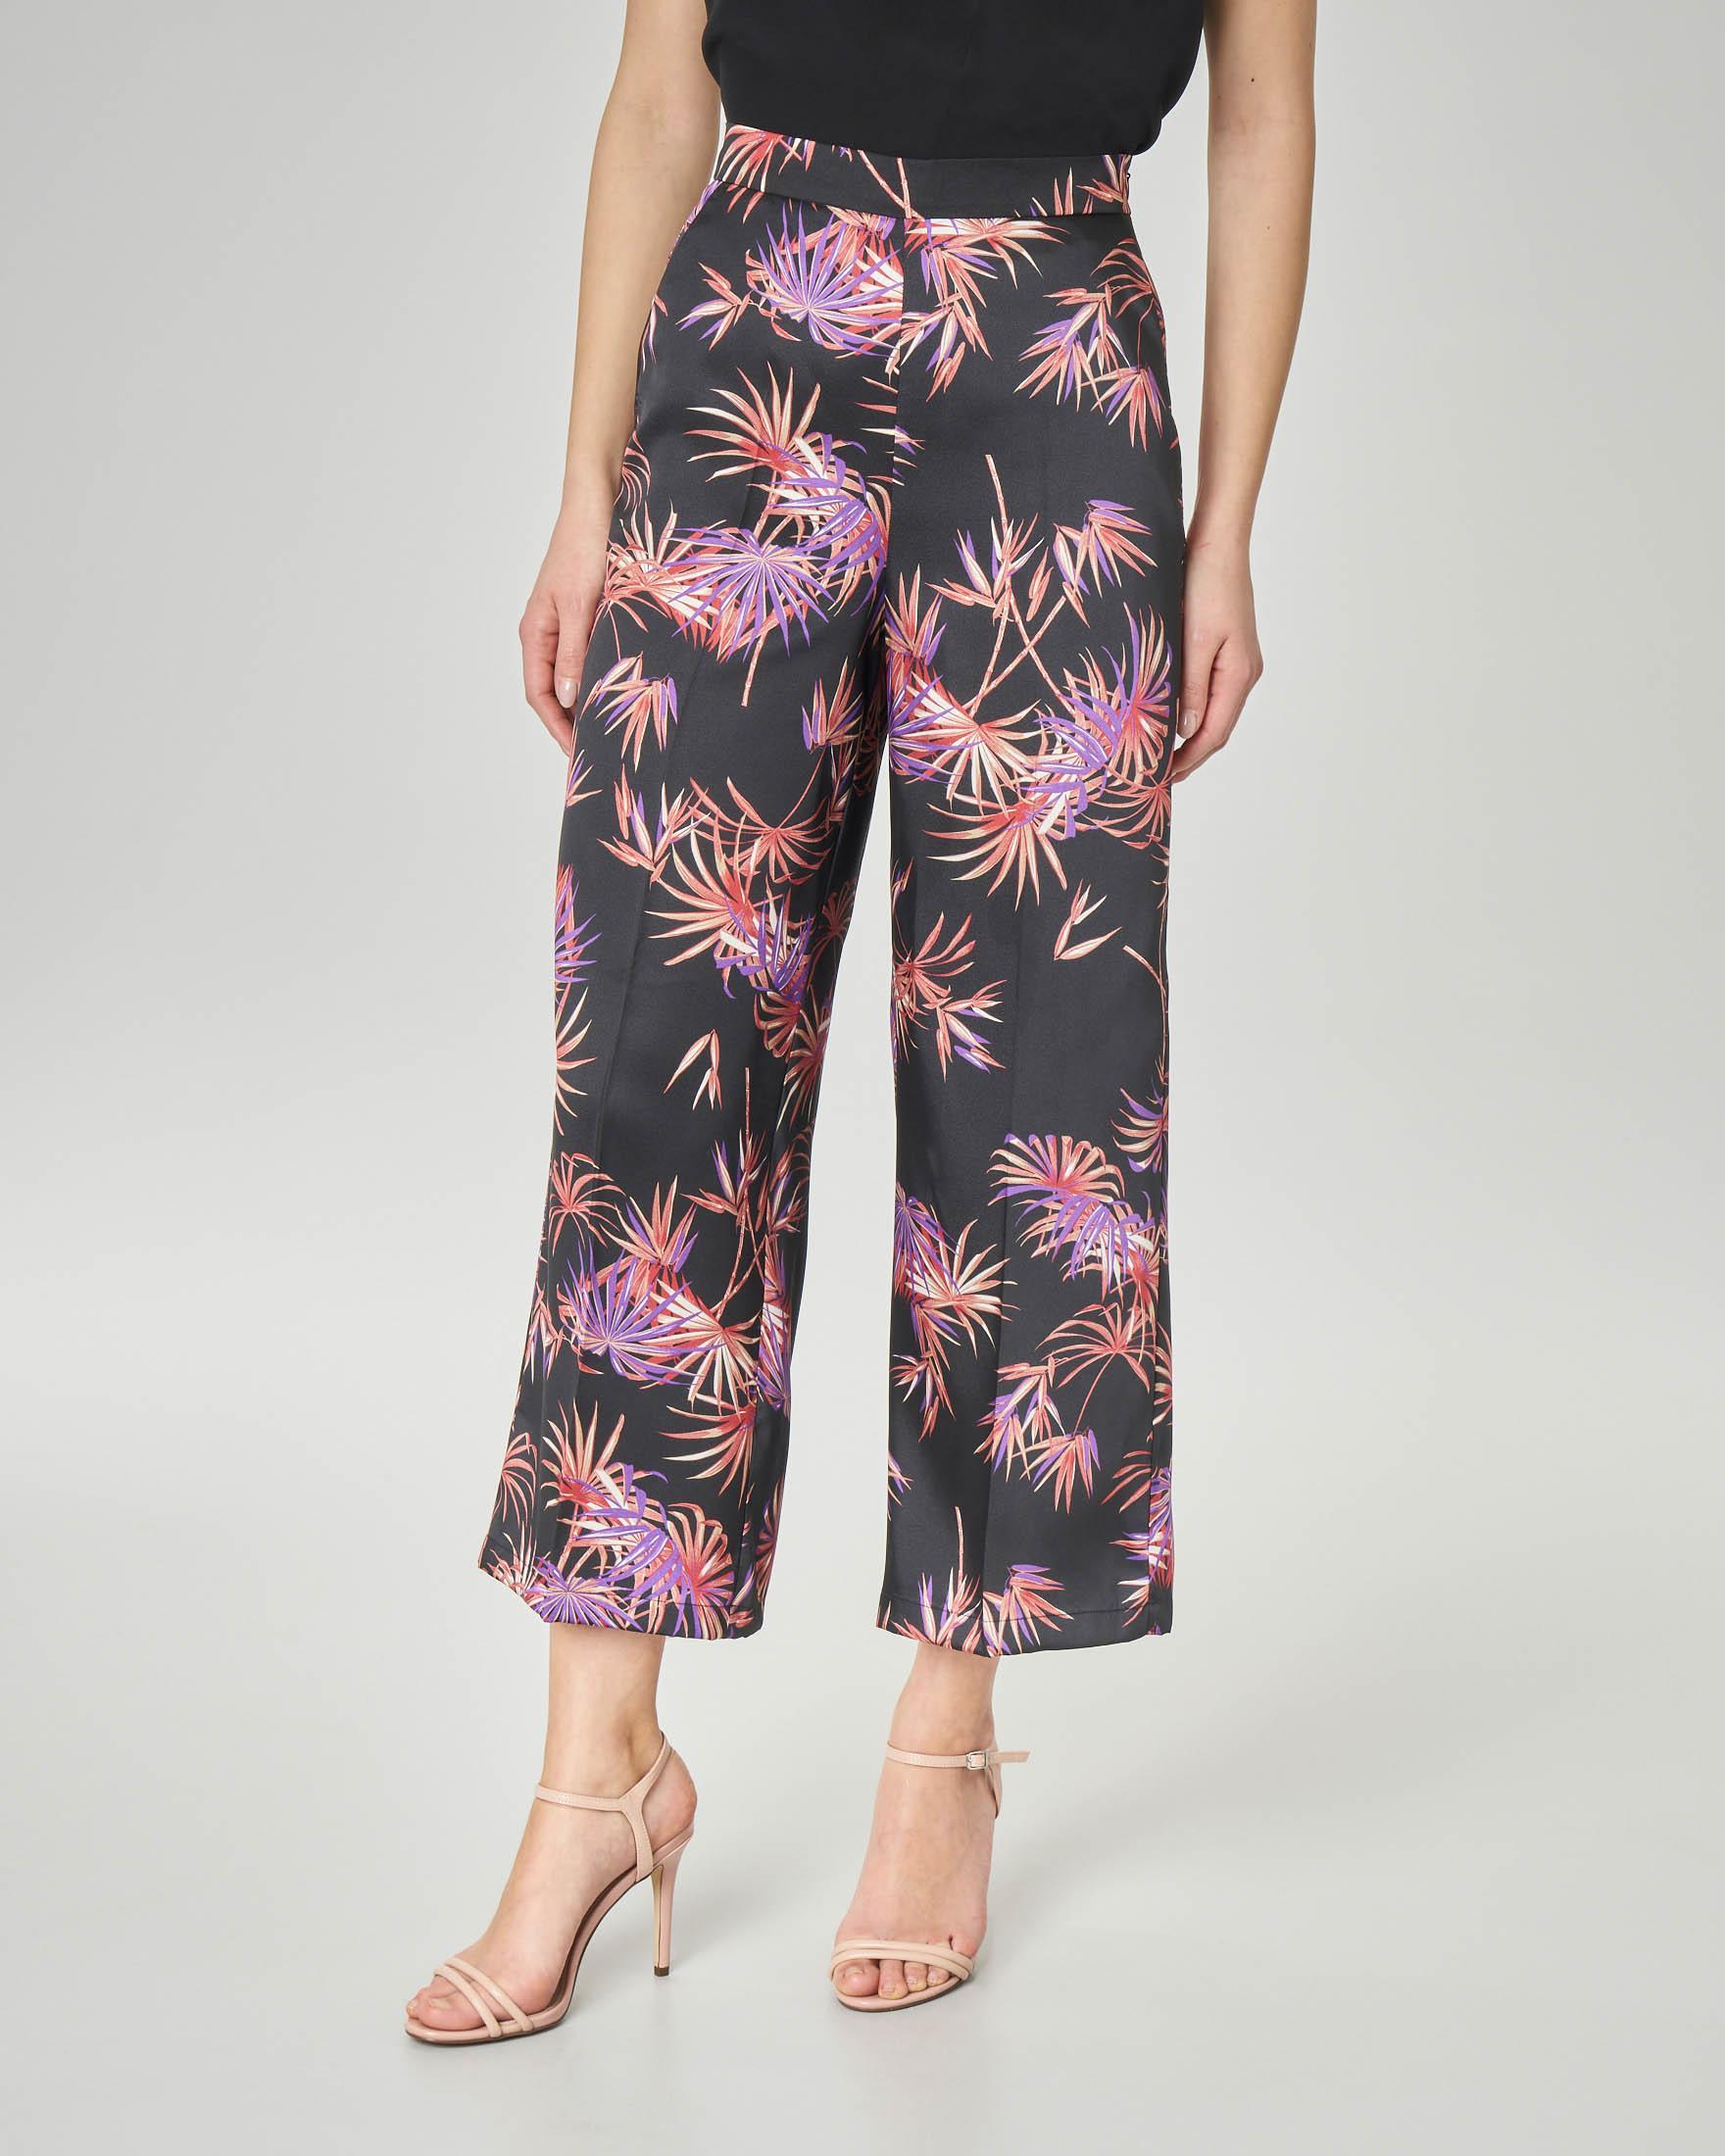 Pantaloni culotte neri a stampa foliage viola